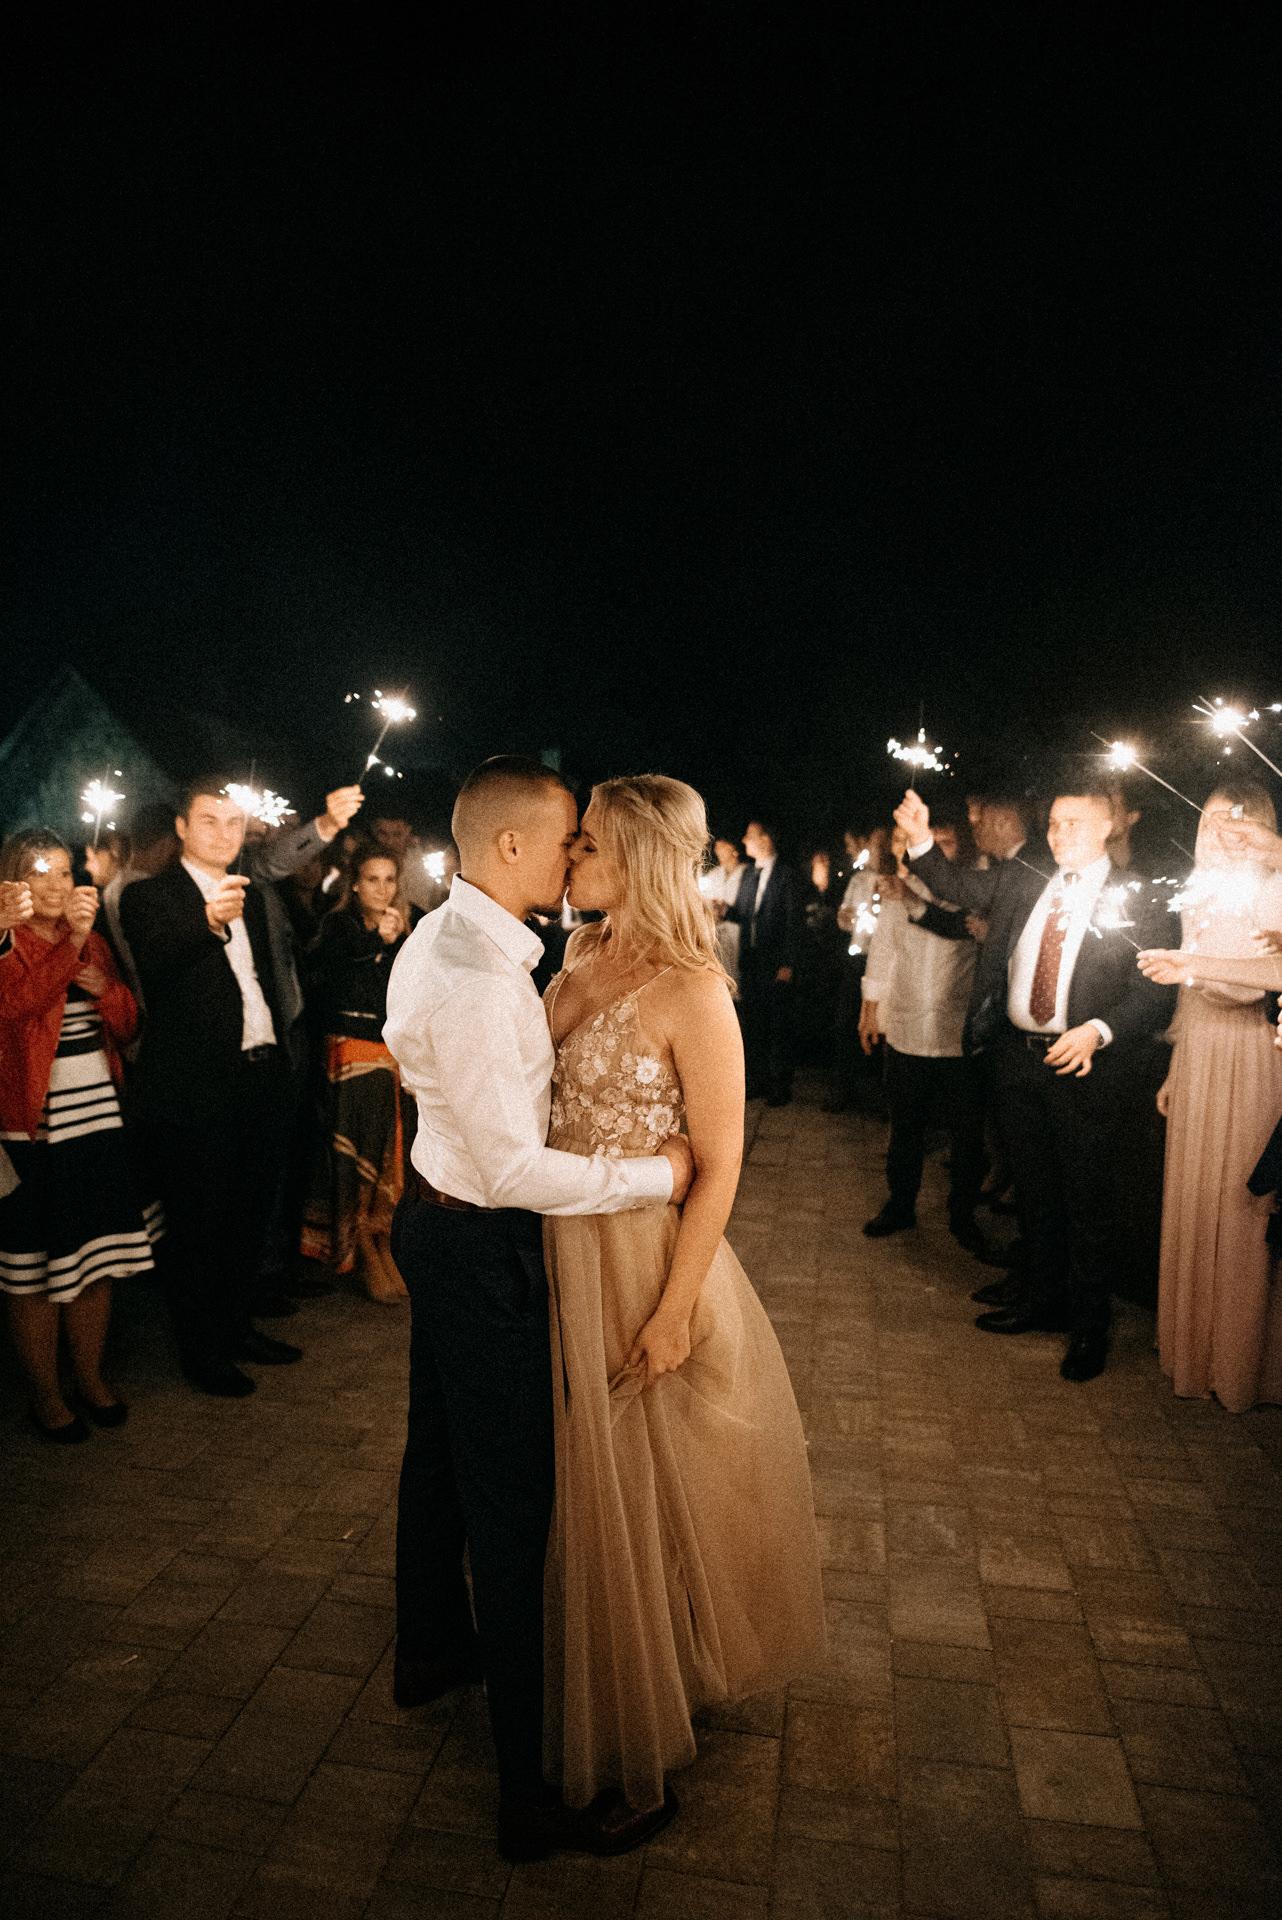 rokusfalvy birtok etyek eskuvo wedding csillagszoro sparkle exit